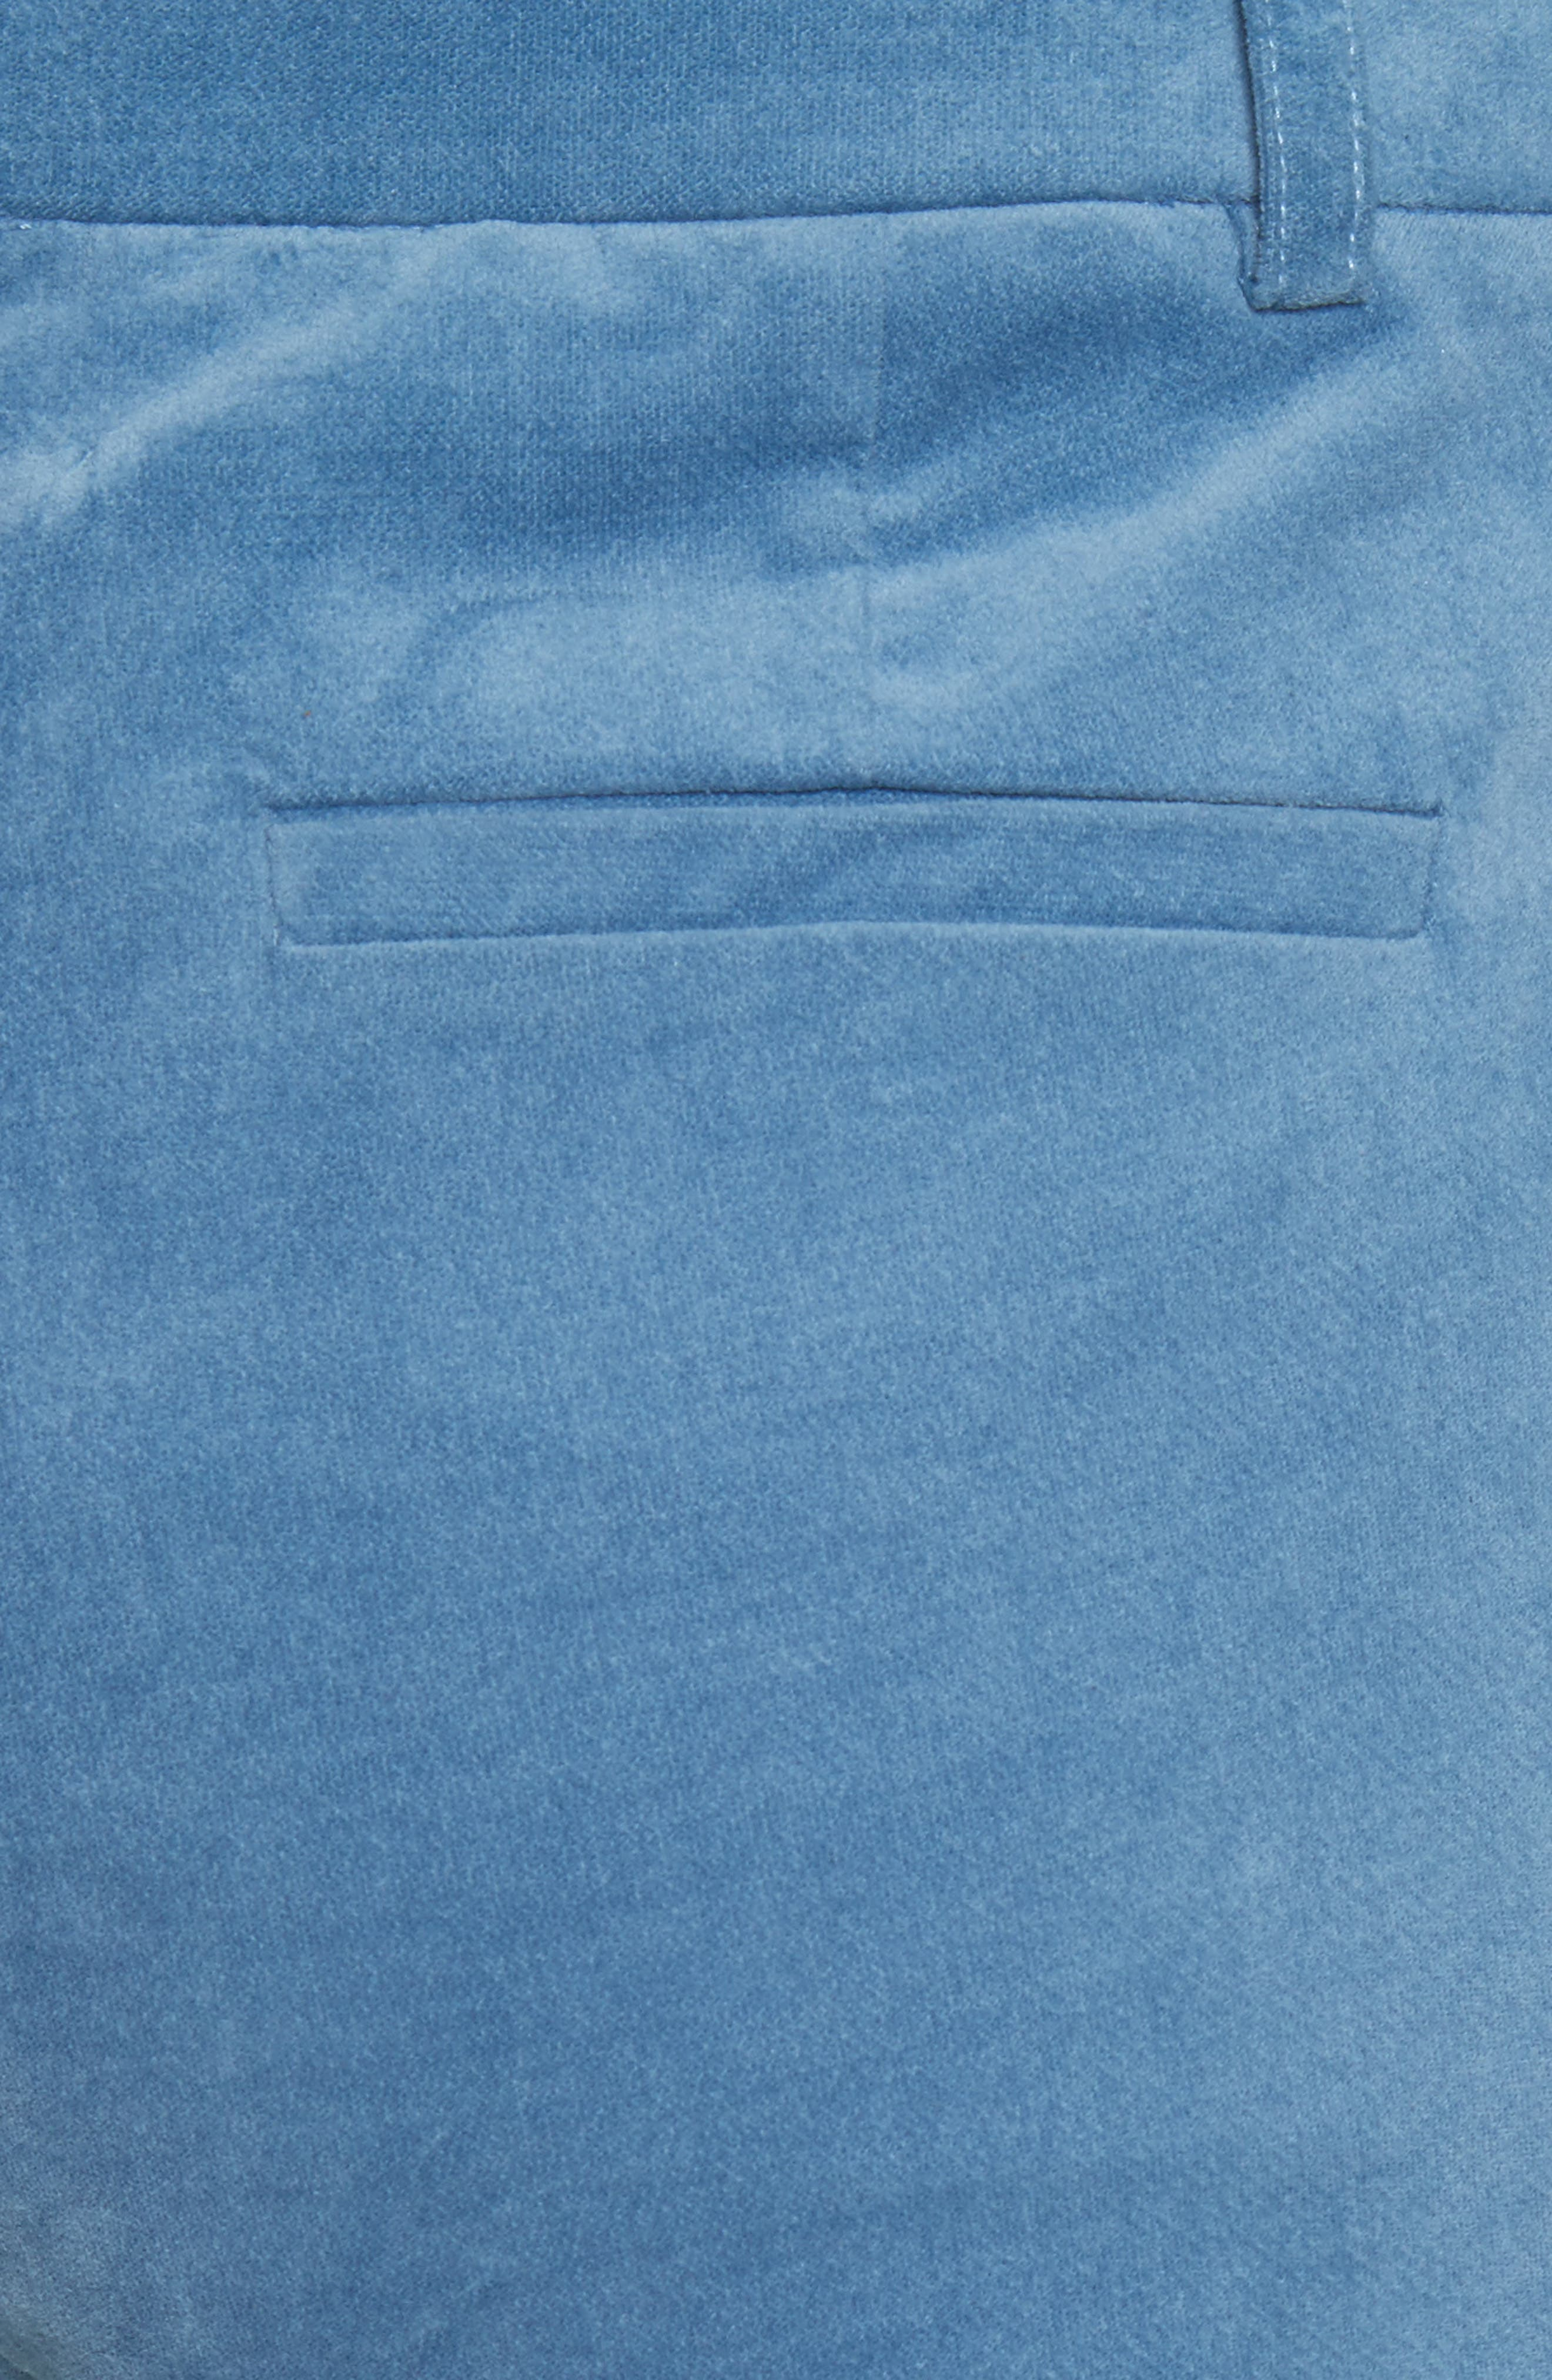 Moleskin Stretch Cotton Skinny Pants,                             Alternate thumbnail 6, color,                             Blue